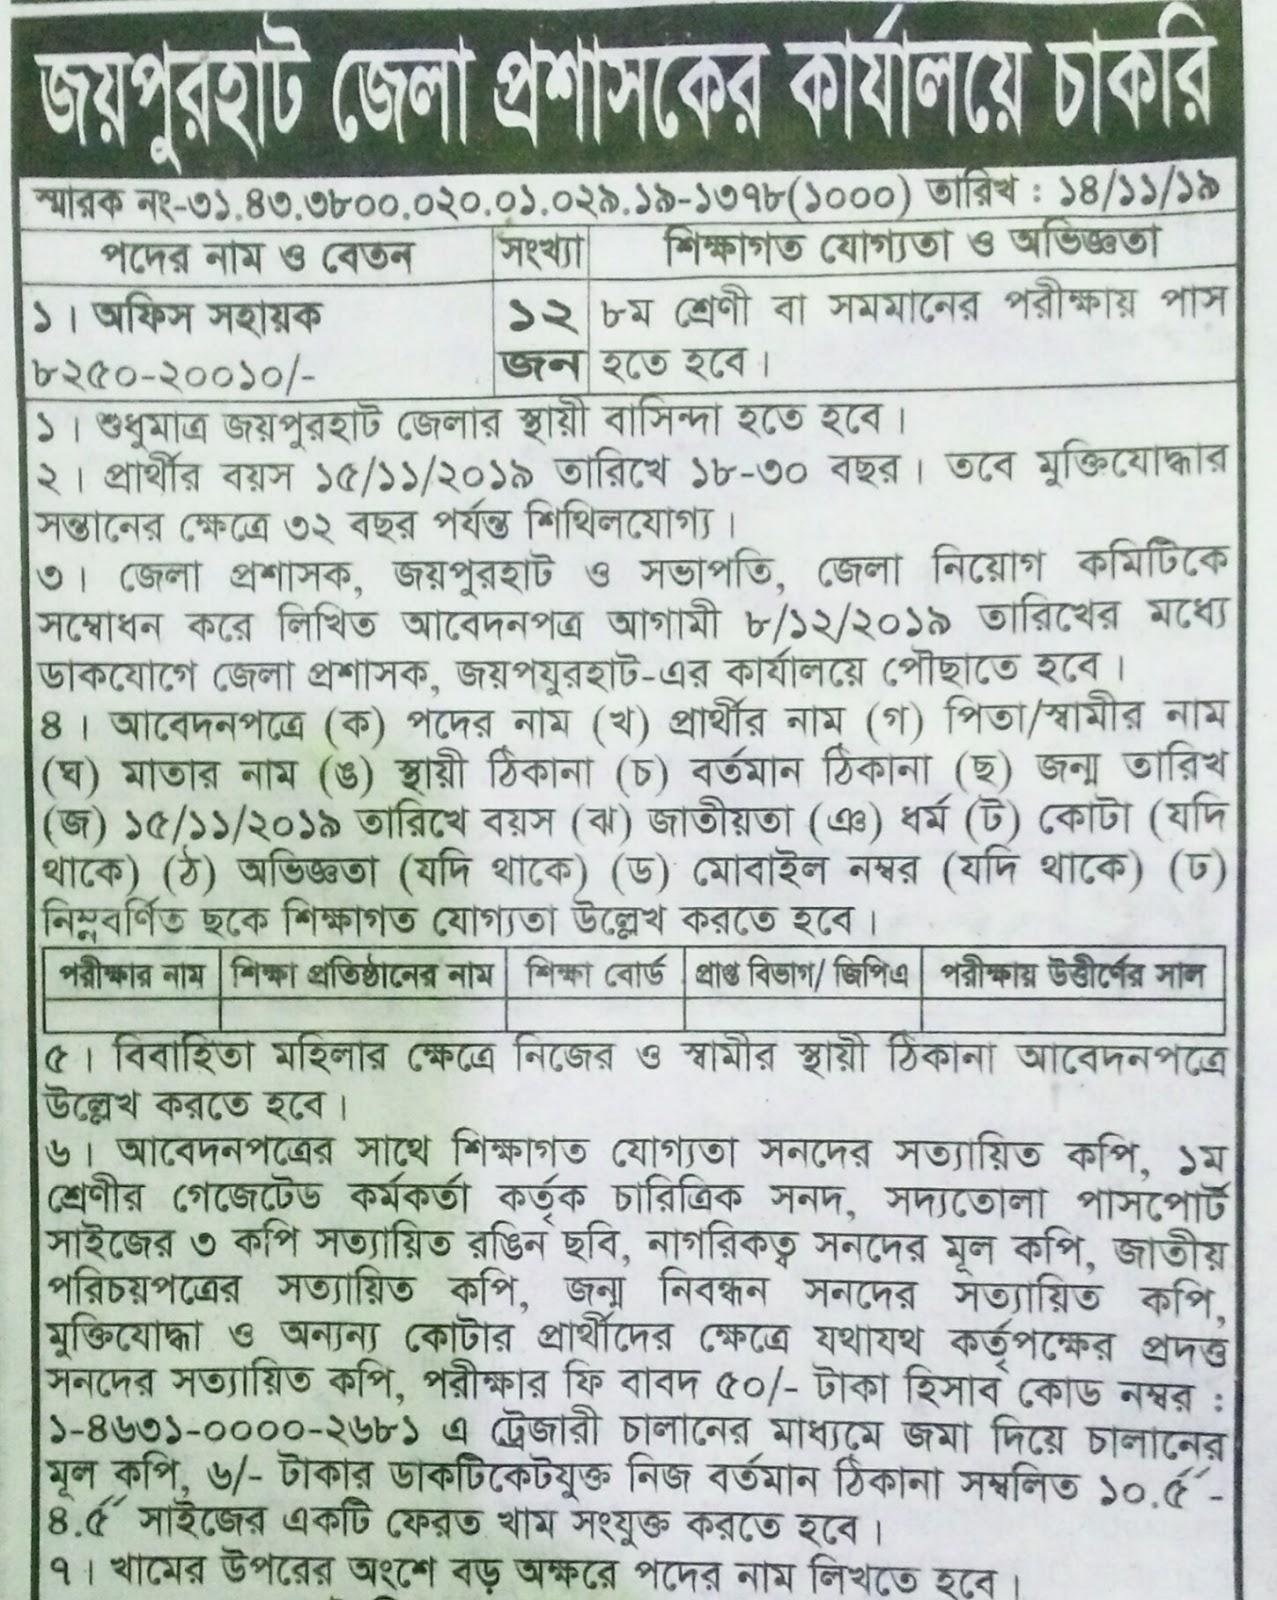 Joypurhat district administrator's office job circular 2019.  জয়পুরহাট জেলা প্রশাসকের কার্যলয় নিয়োগ বিজ্ঞপ্তি ২০১৯